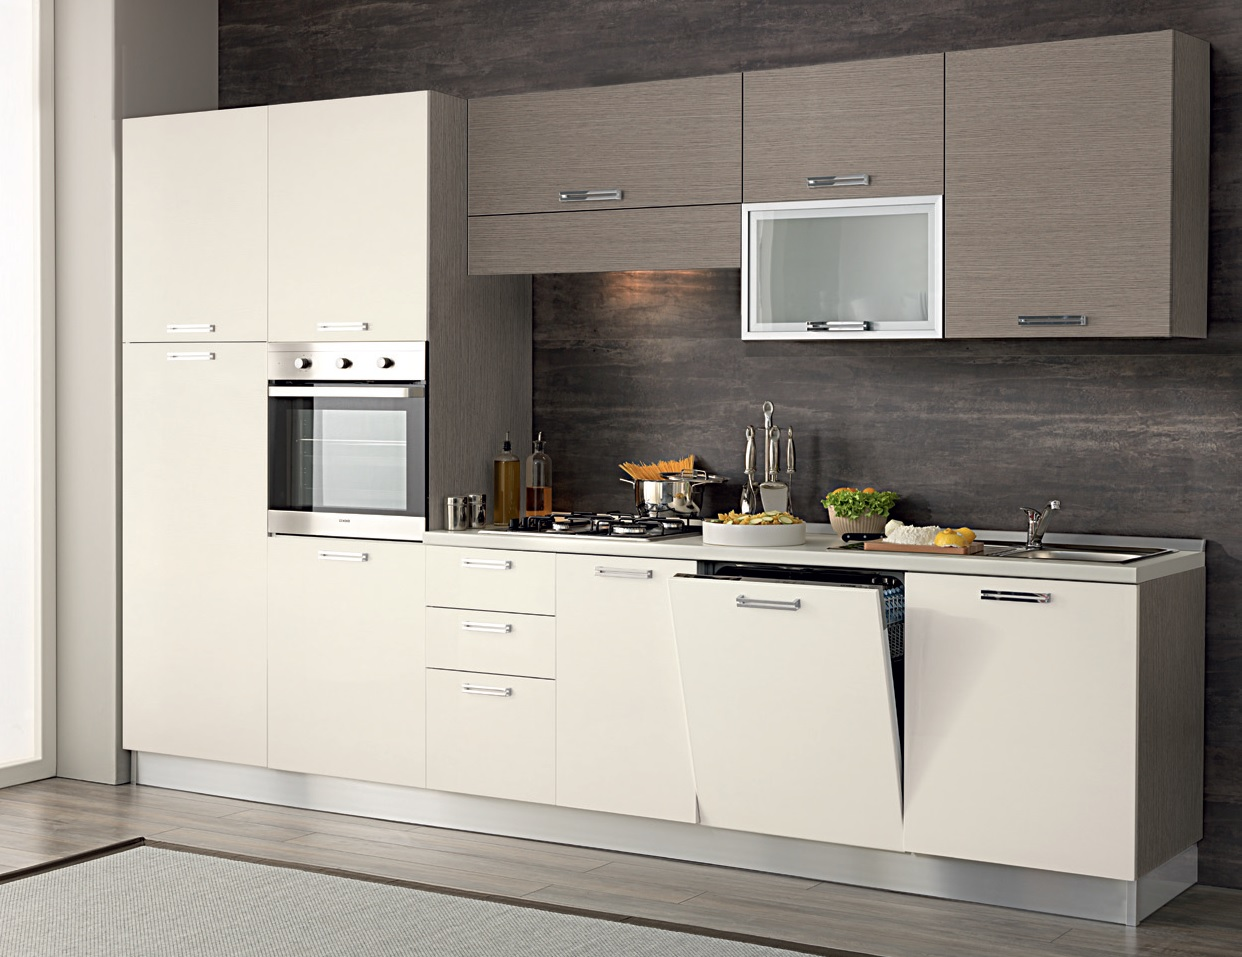 Vendita mobili per cucina economici design casa creativa for Mobili da cucina economici